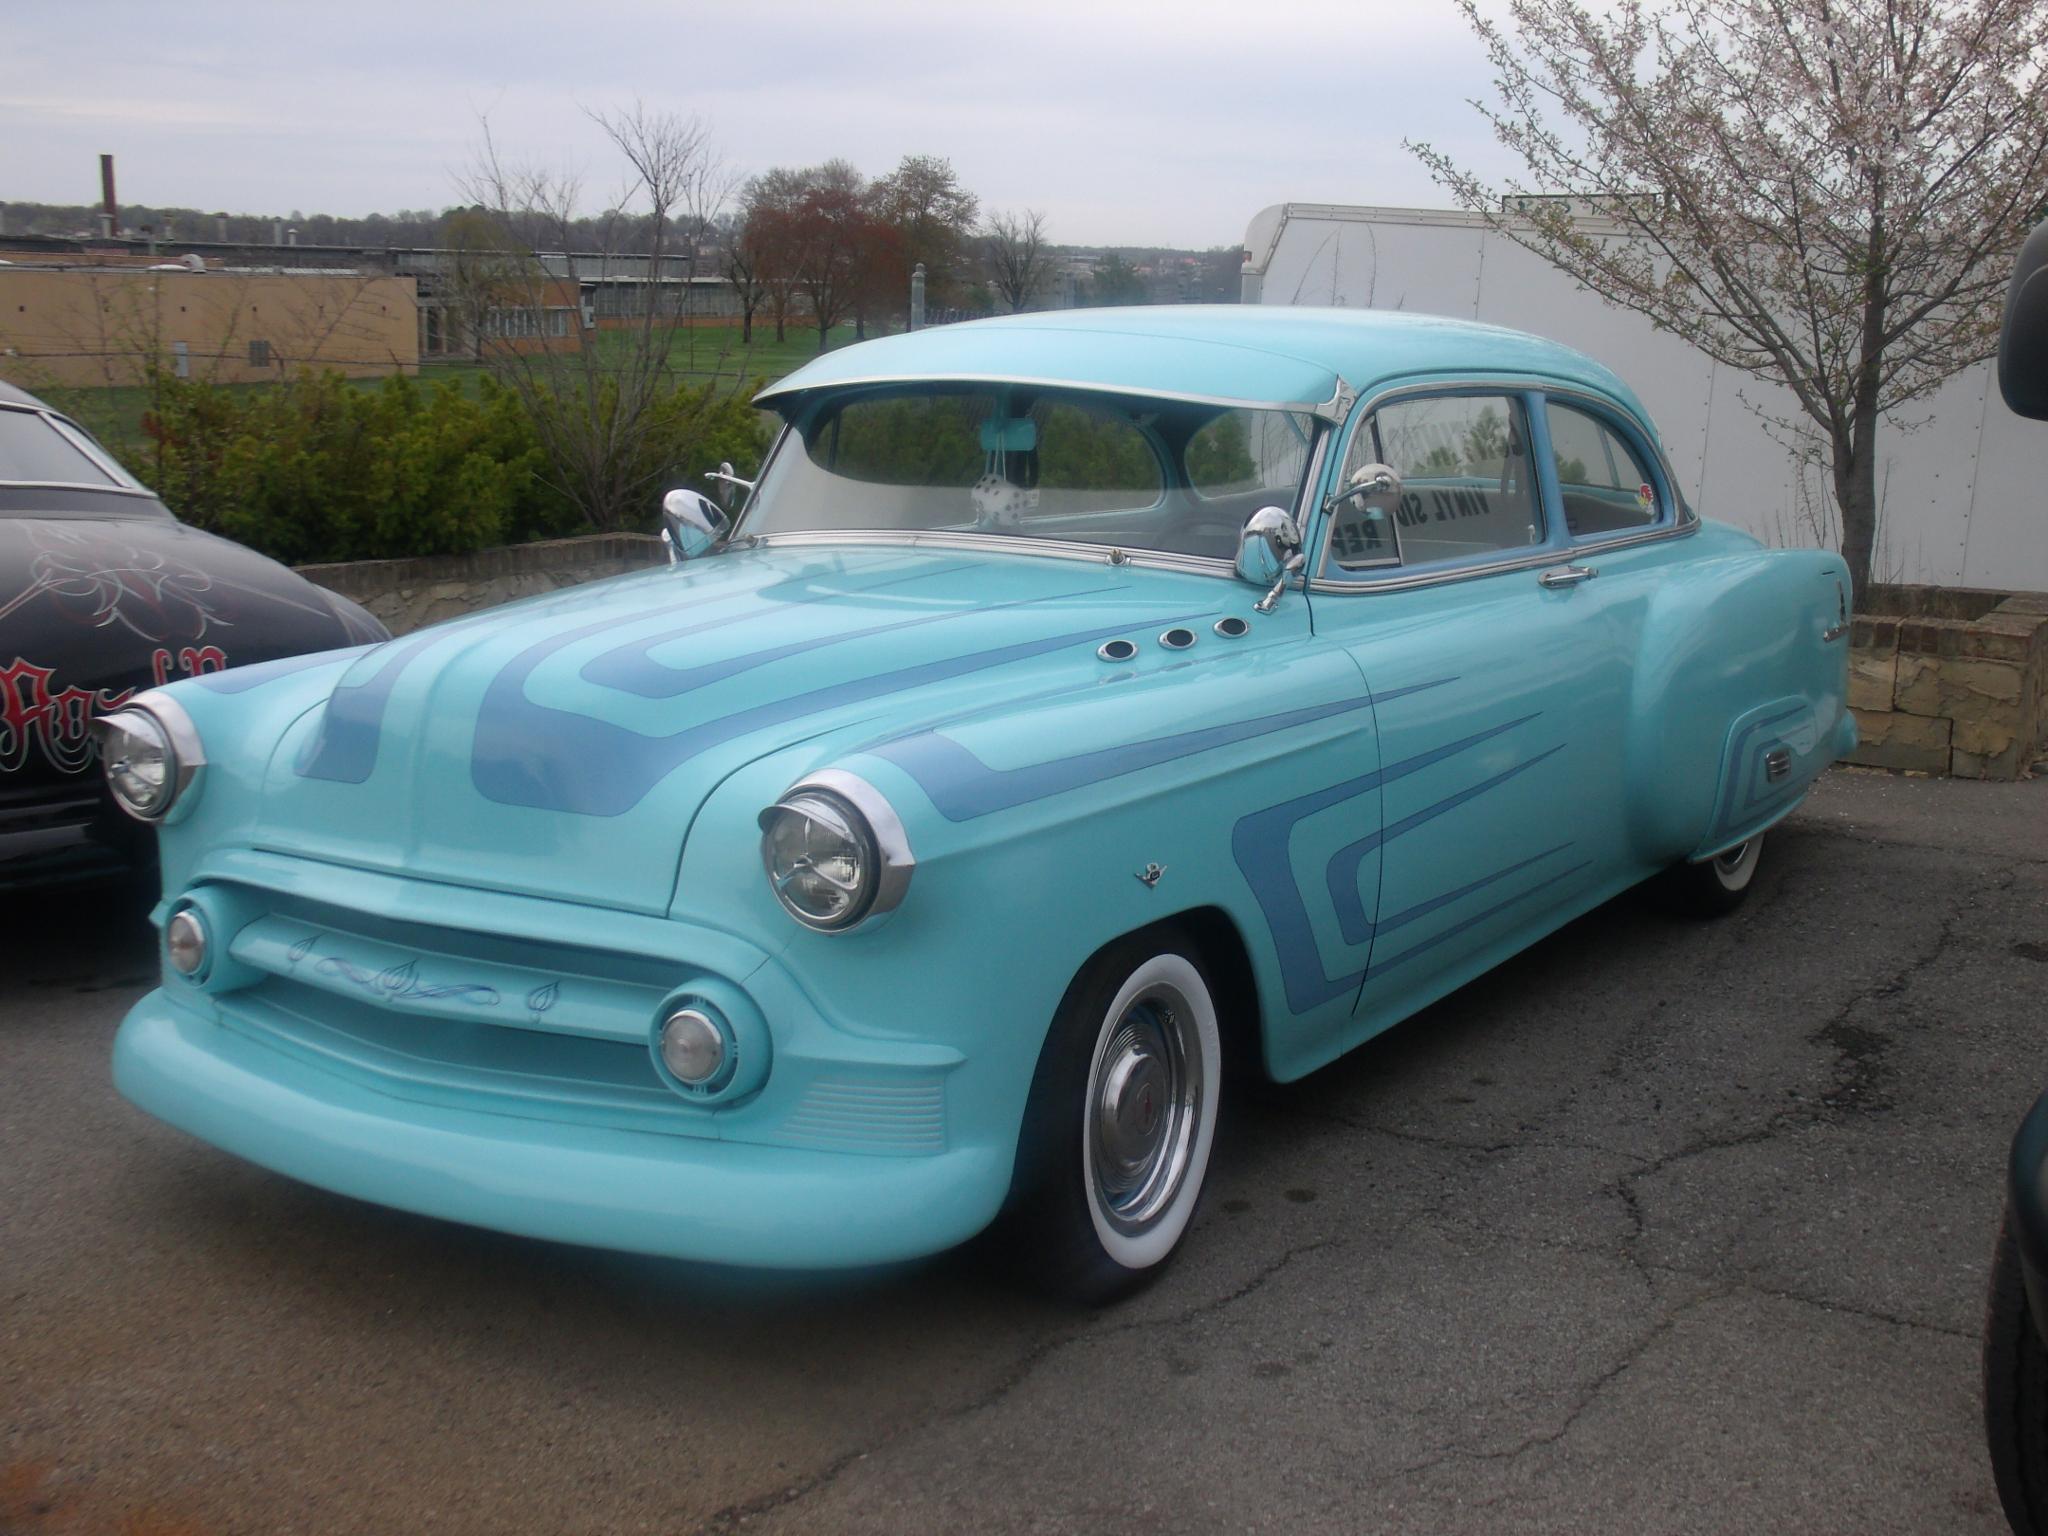 Another Vintage Automobile by Michael Glaze, Jr.